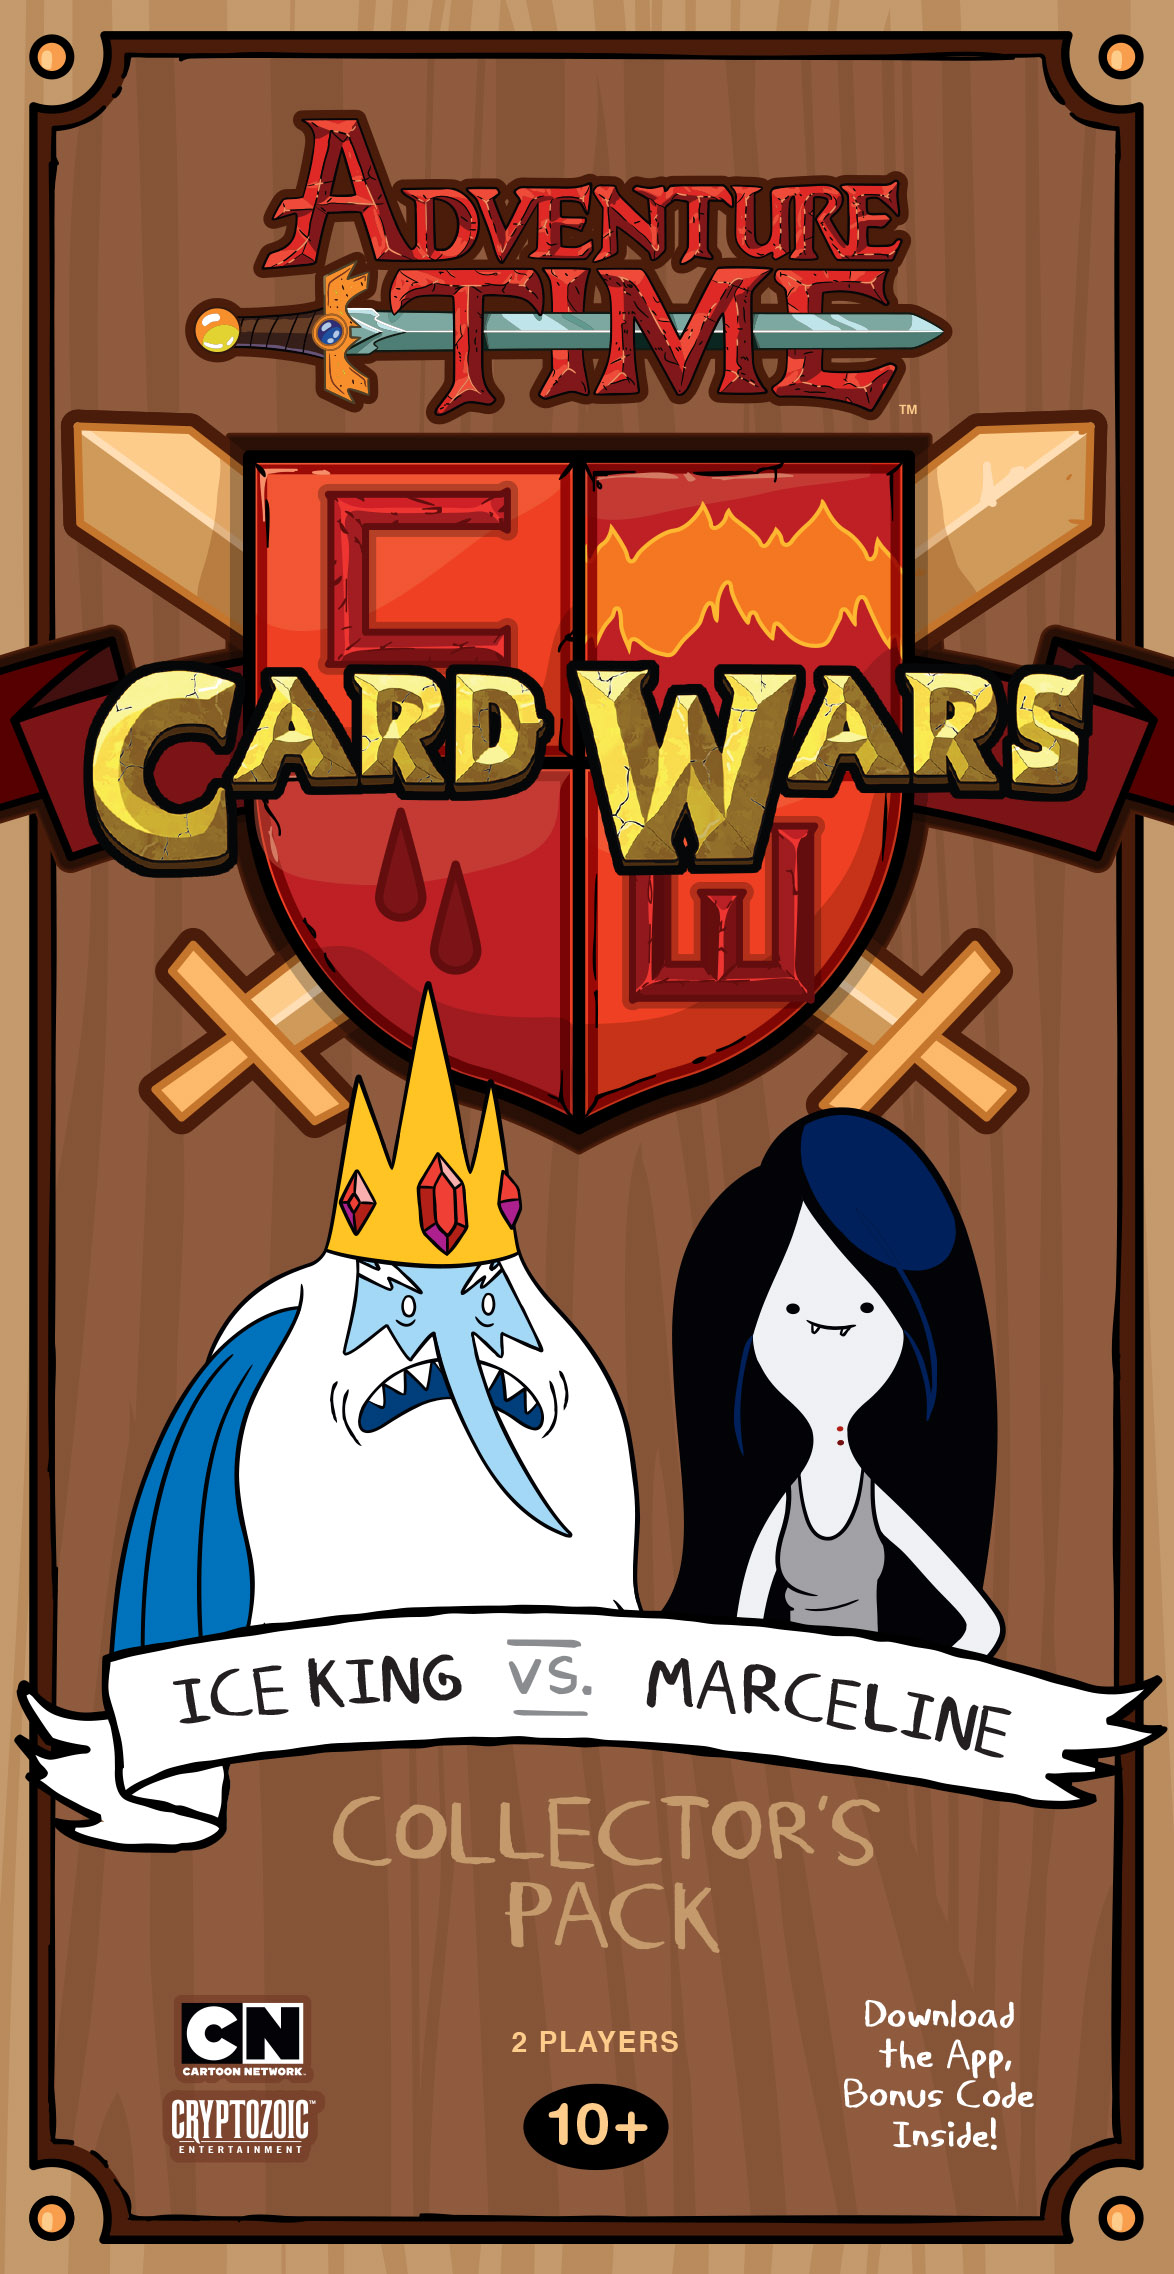 Adventure Time Card Wars: Ice King vs. Marceline imagine